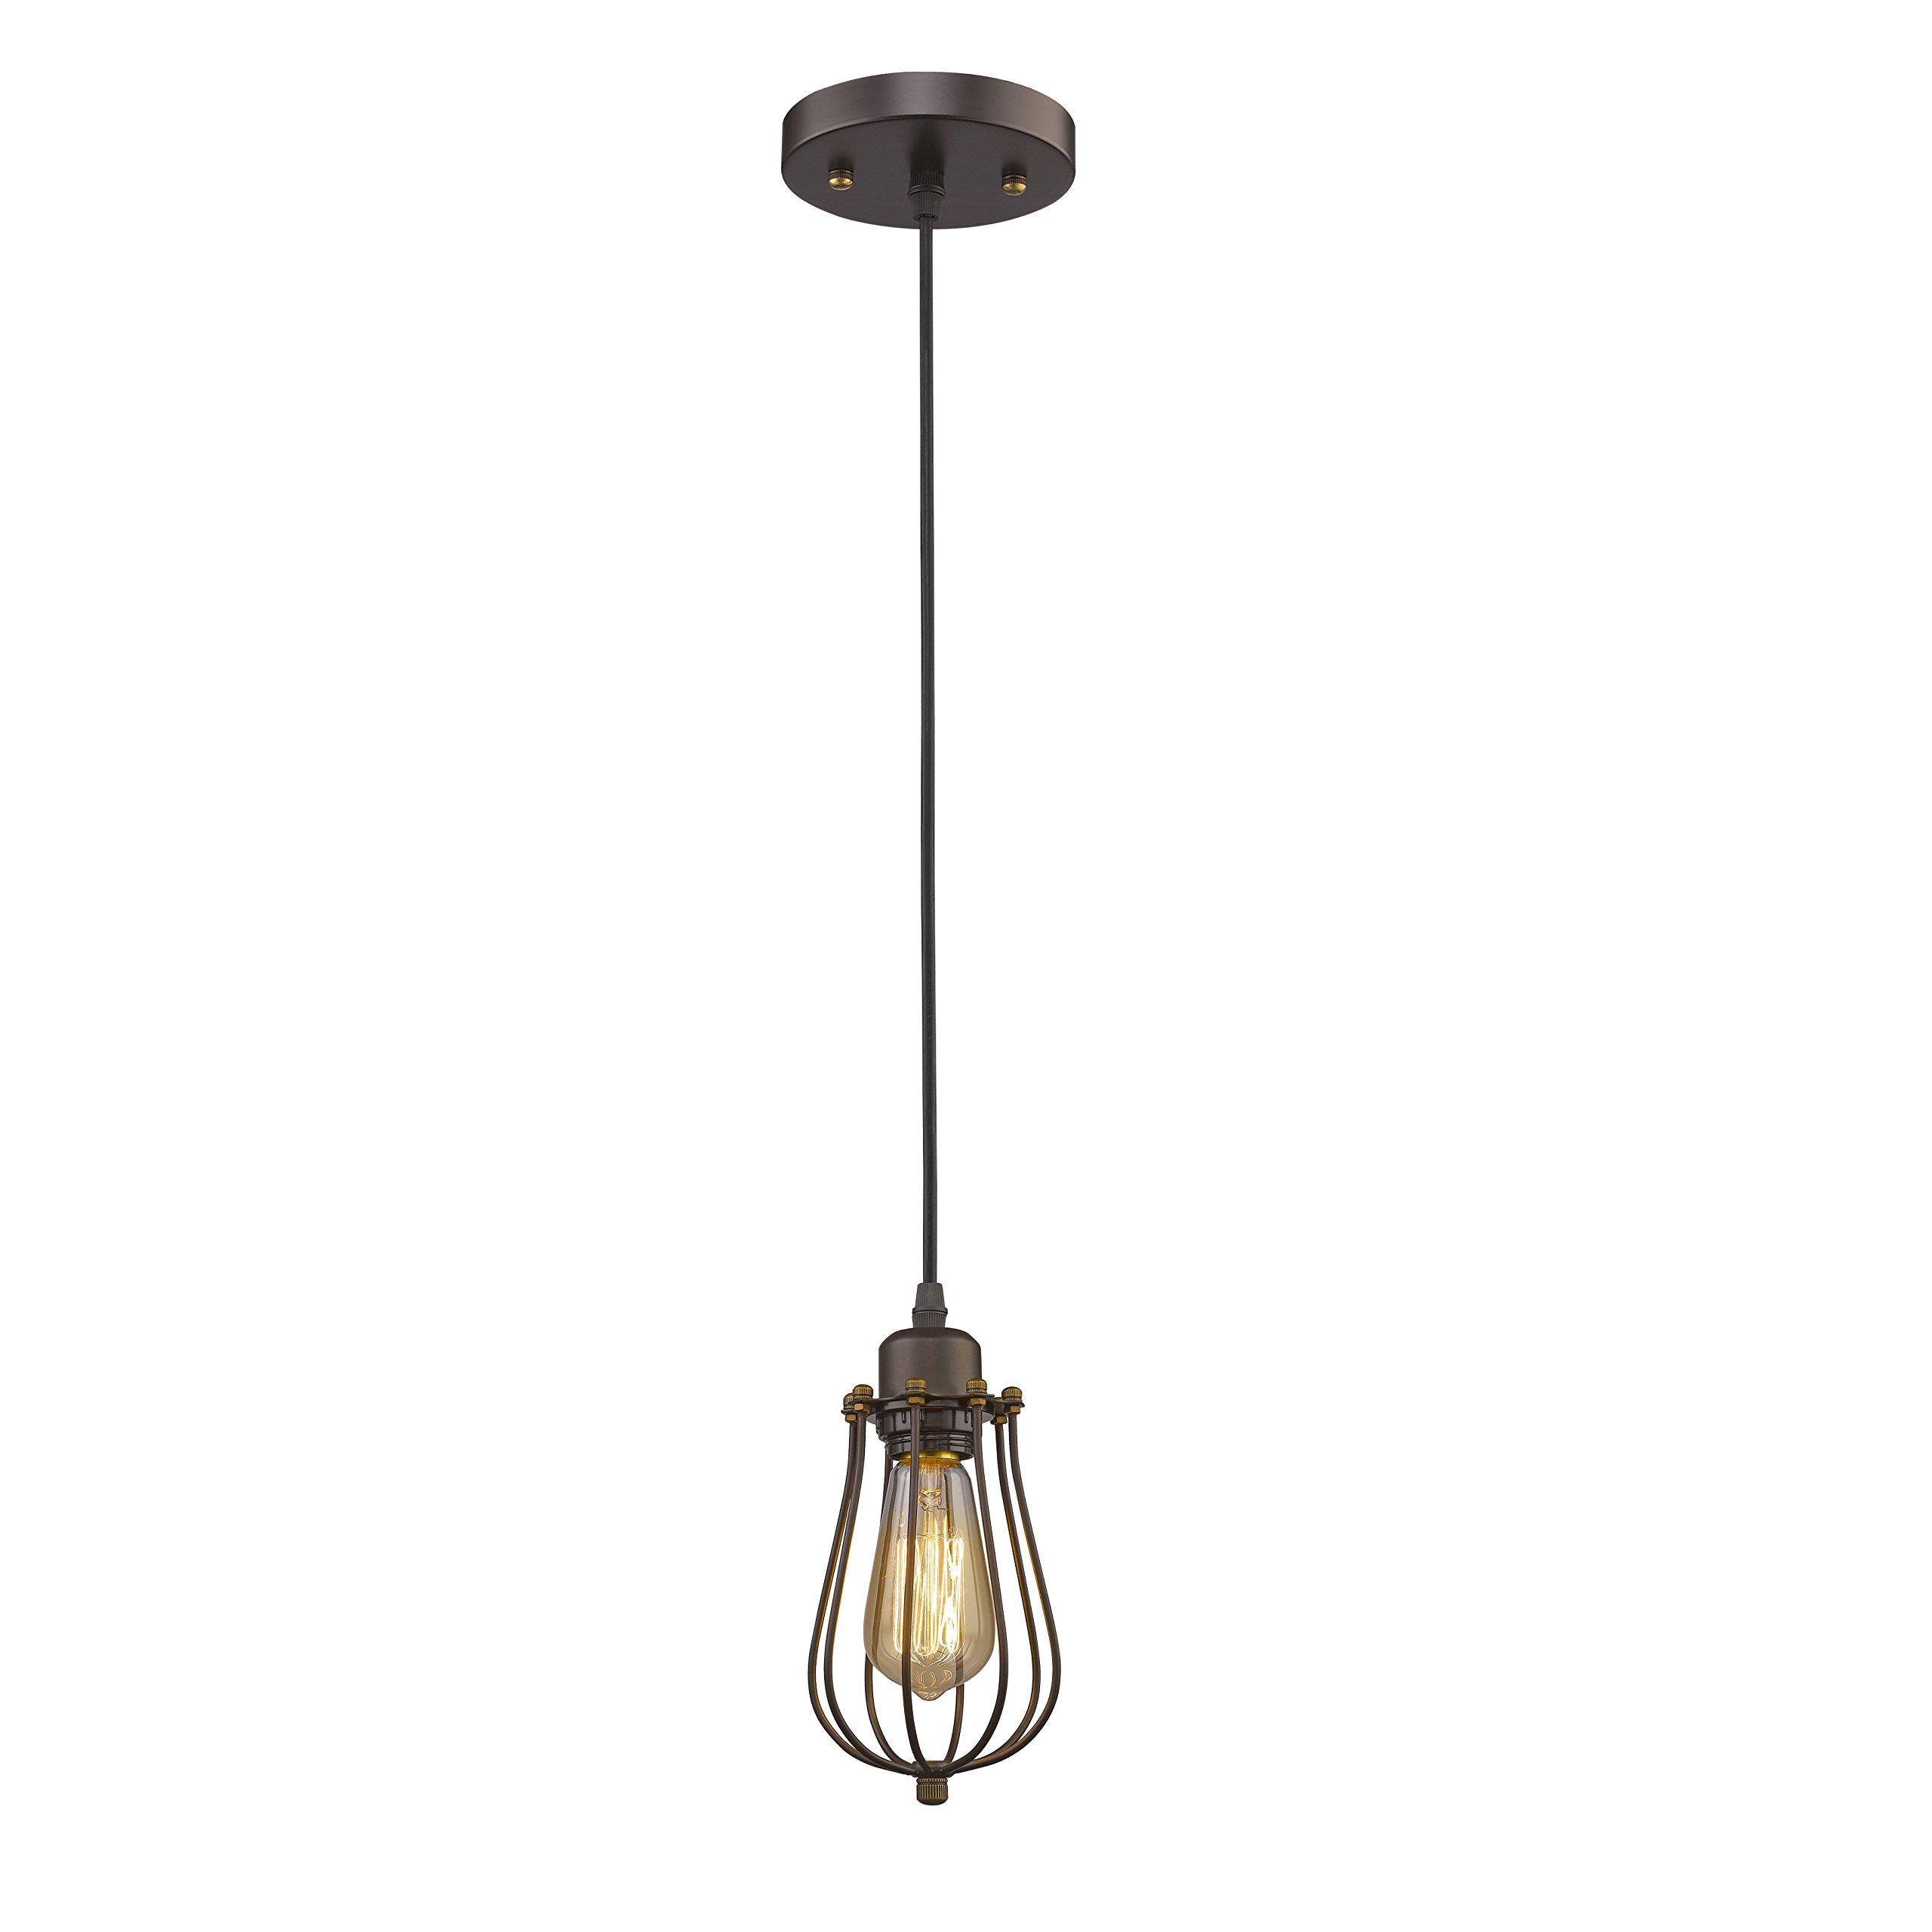 MICSIU Antique Industrial Pendant Light Hanging Caged Pendant Light Fixture with Edison 60W ST58 Bulb for Home, Restaurant, café, Bar. Kitchen.